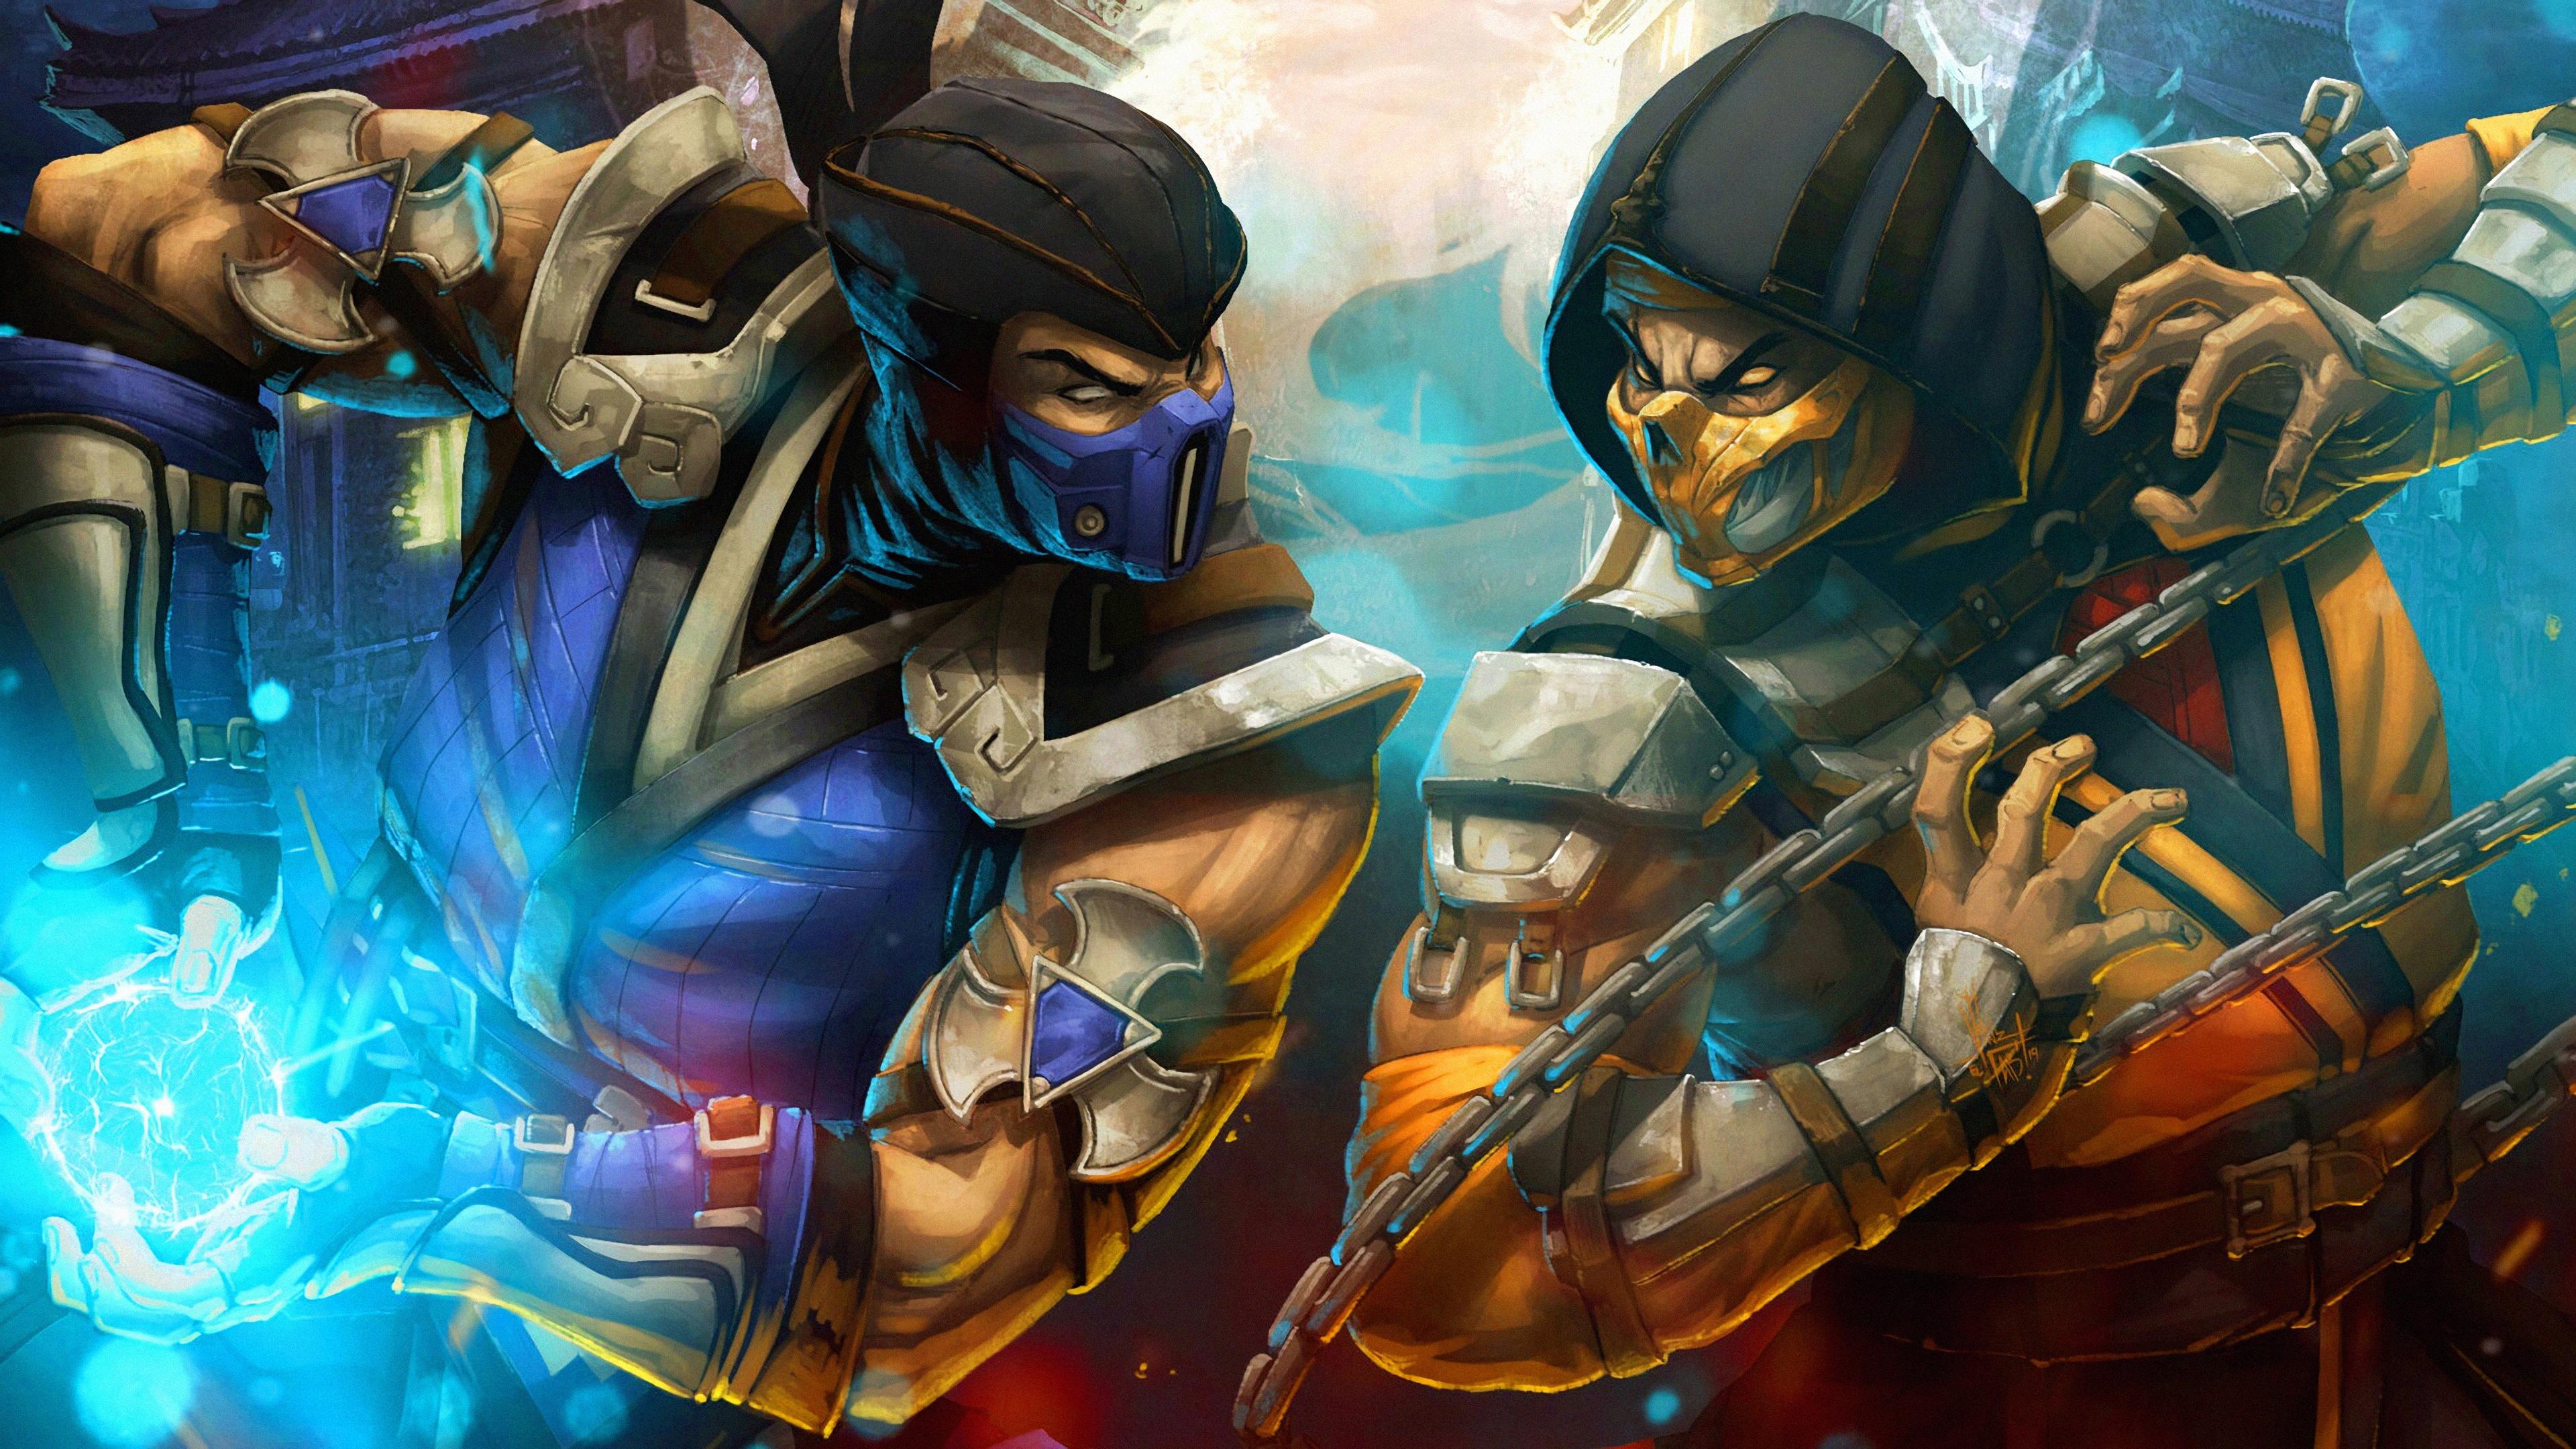 mortal kombat 1570393015 - Mortal Kombat - mortal kombat wallpapers, mortal kombat 11 wallpapers, hd-wallpapers, games wallpapers, 4k-wallpapers, 2019 games wallpapers